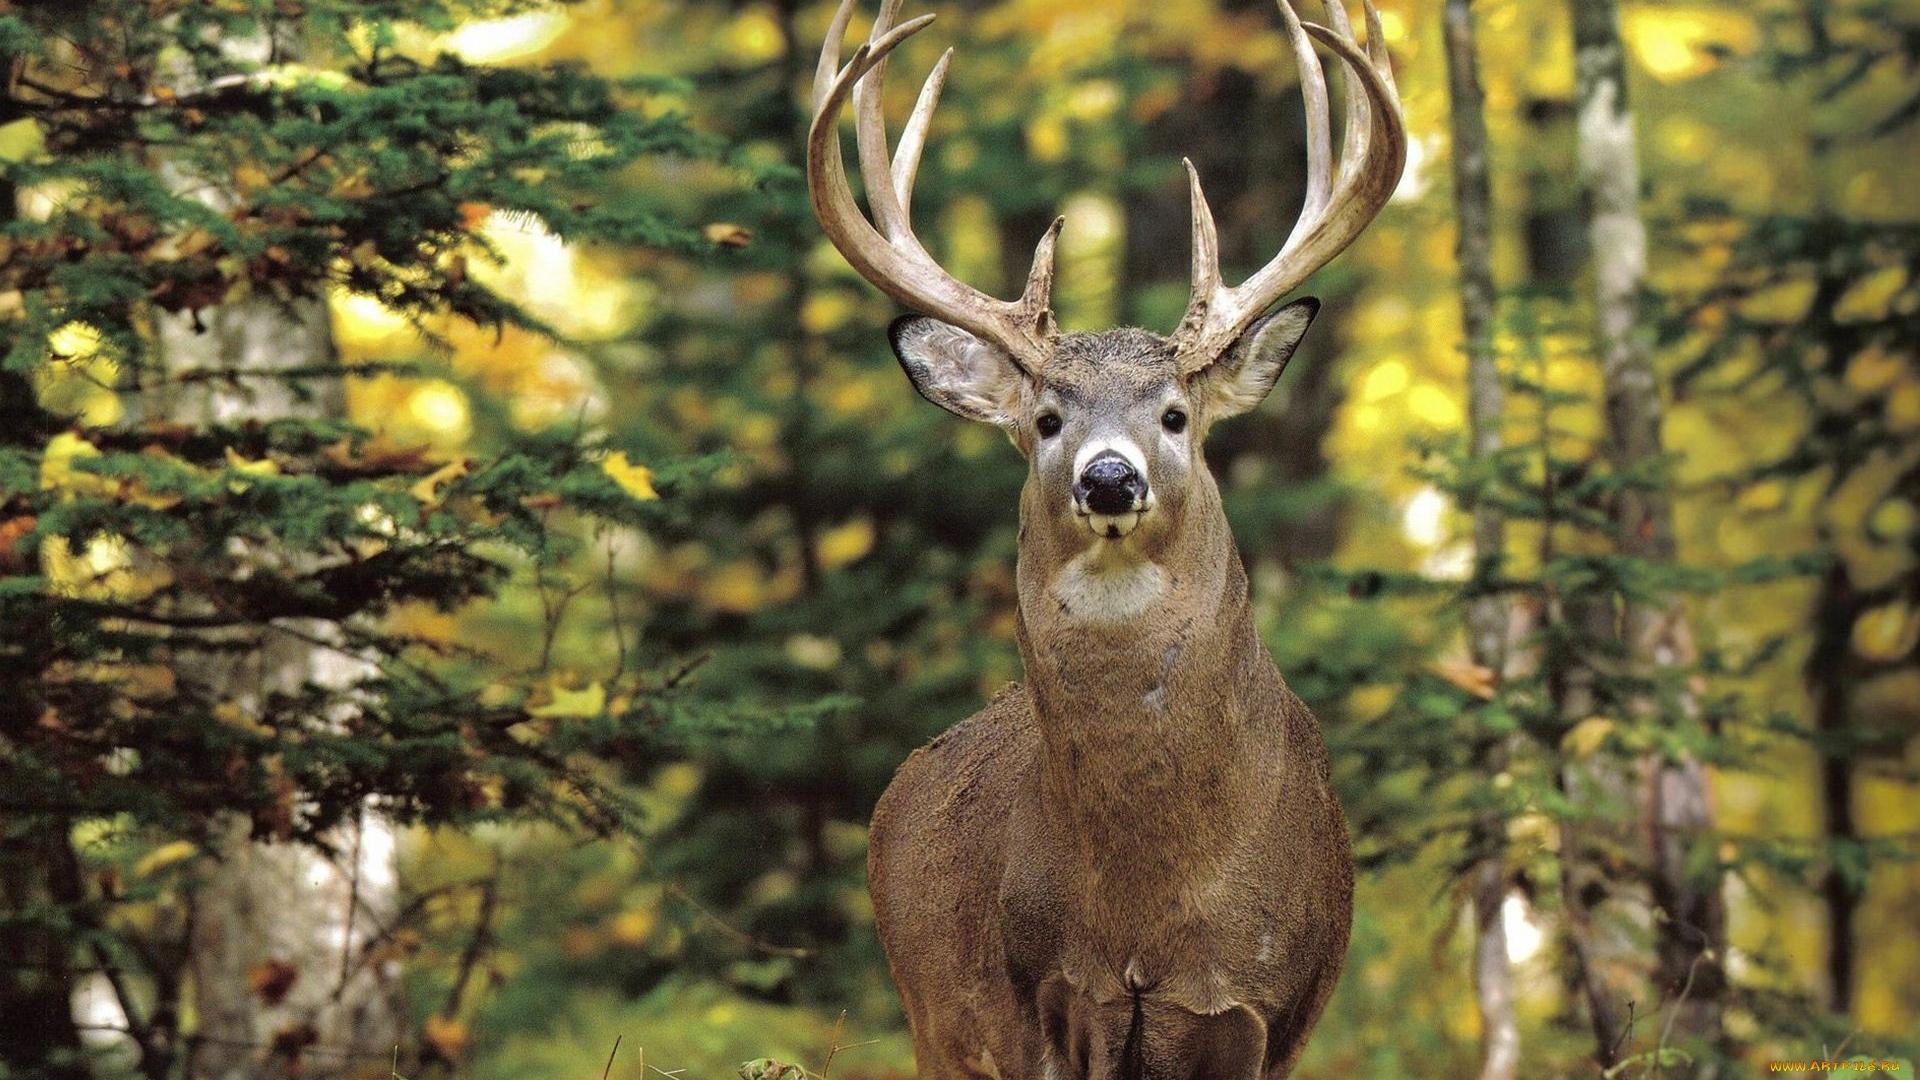 Deer In The Forest desktop wallpaper hd